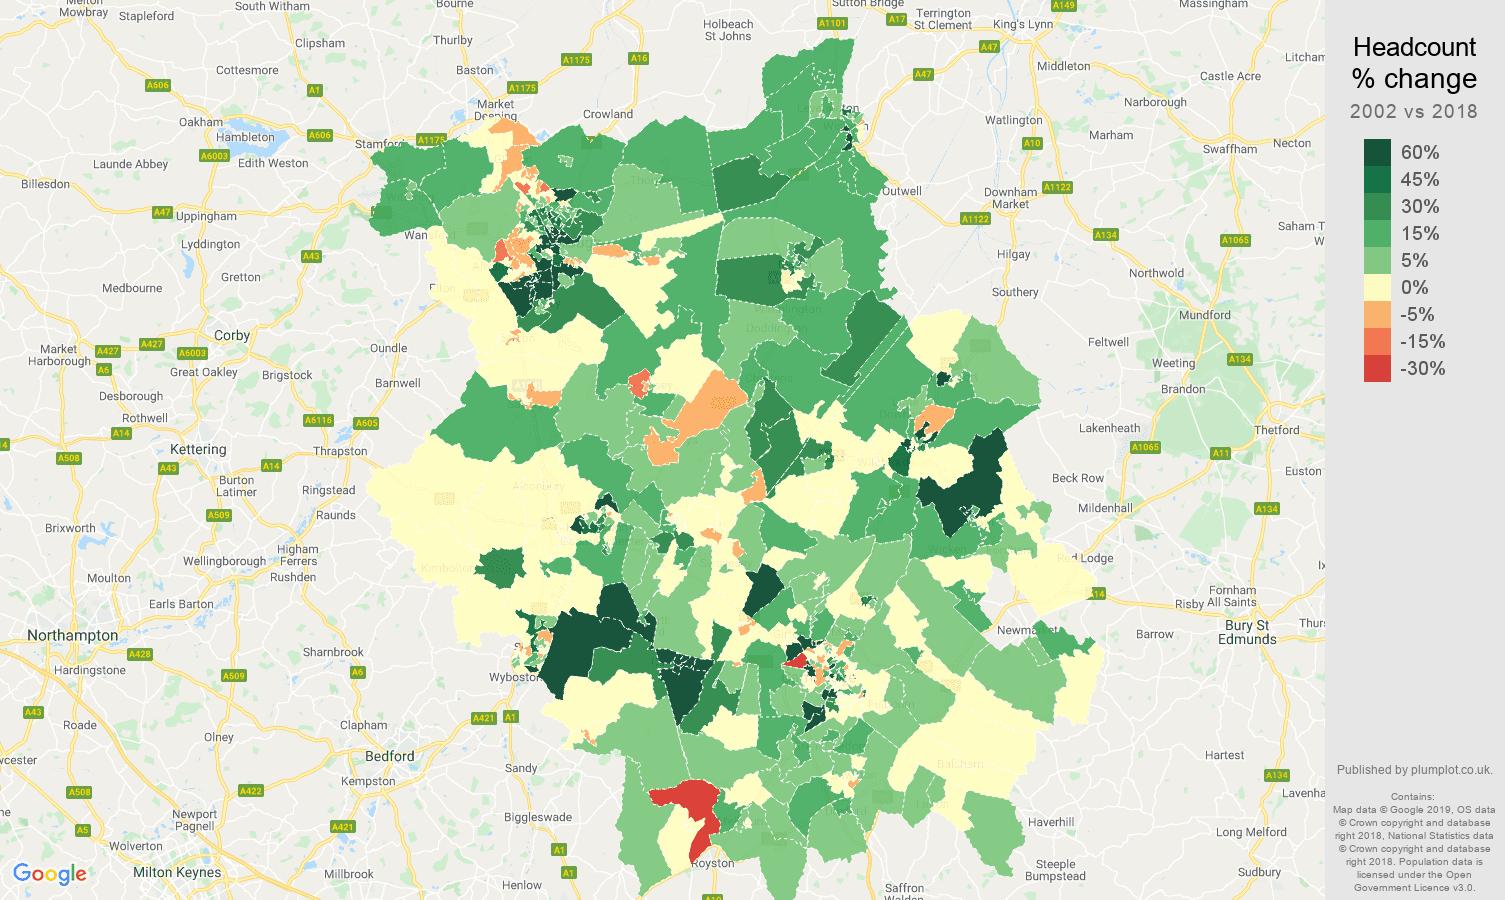 Cambridgeshire headcount change map